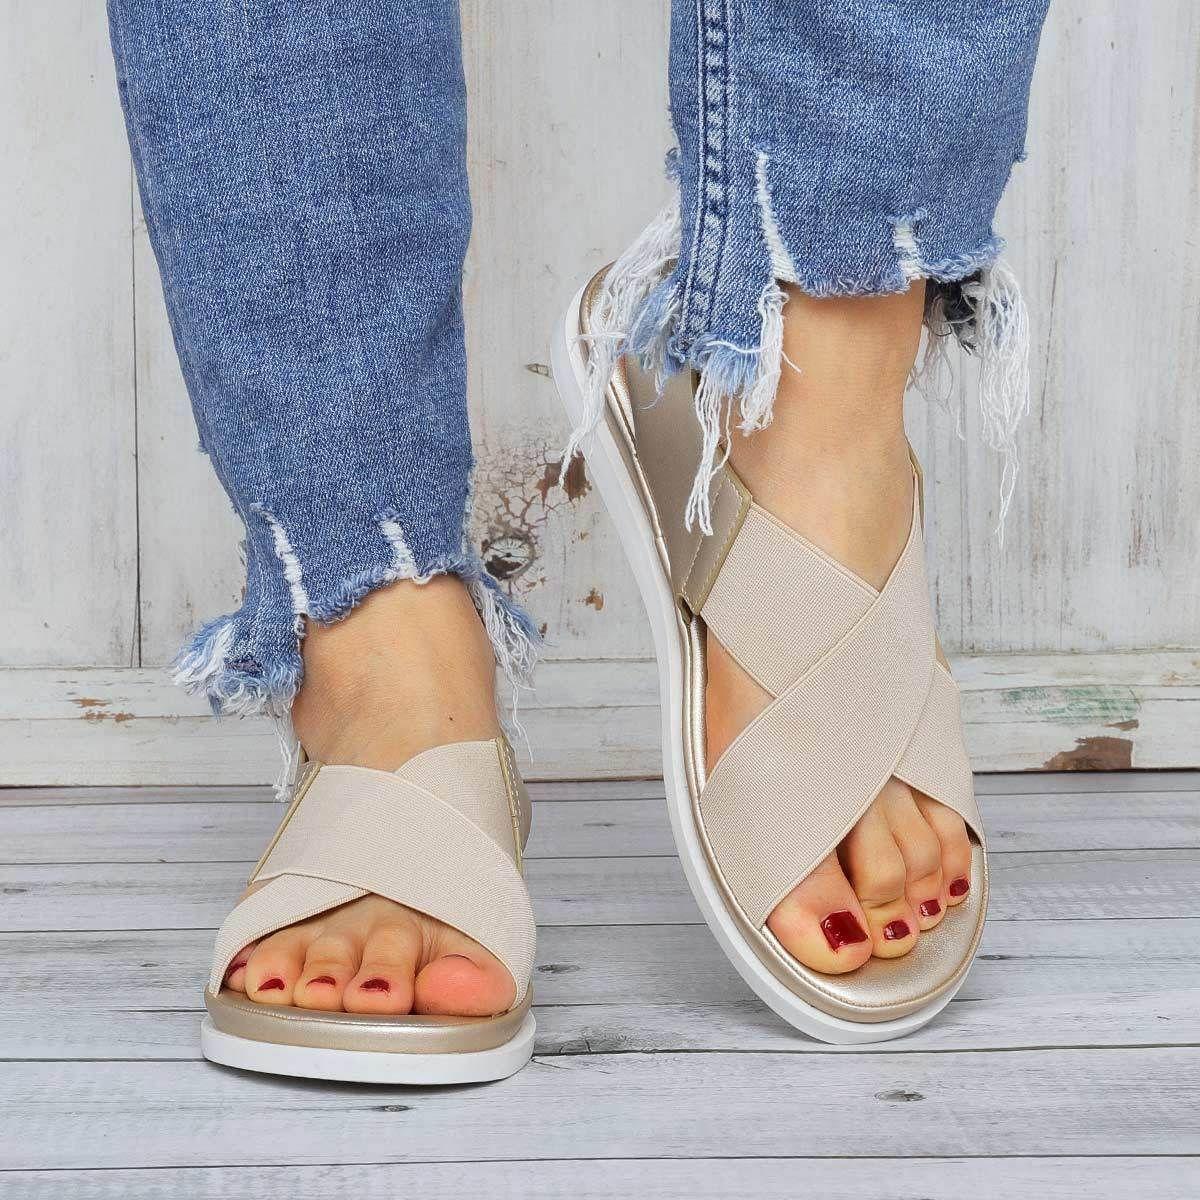 Flat Sandals Women Comfortable Platform Summer Womens Shoes Ladies Summer Sandals,Gray,7